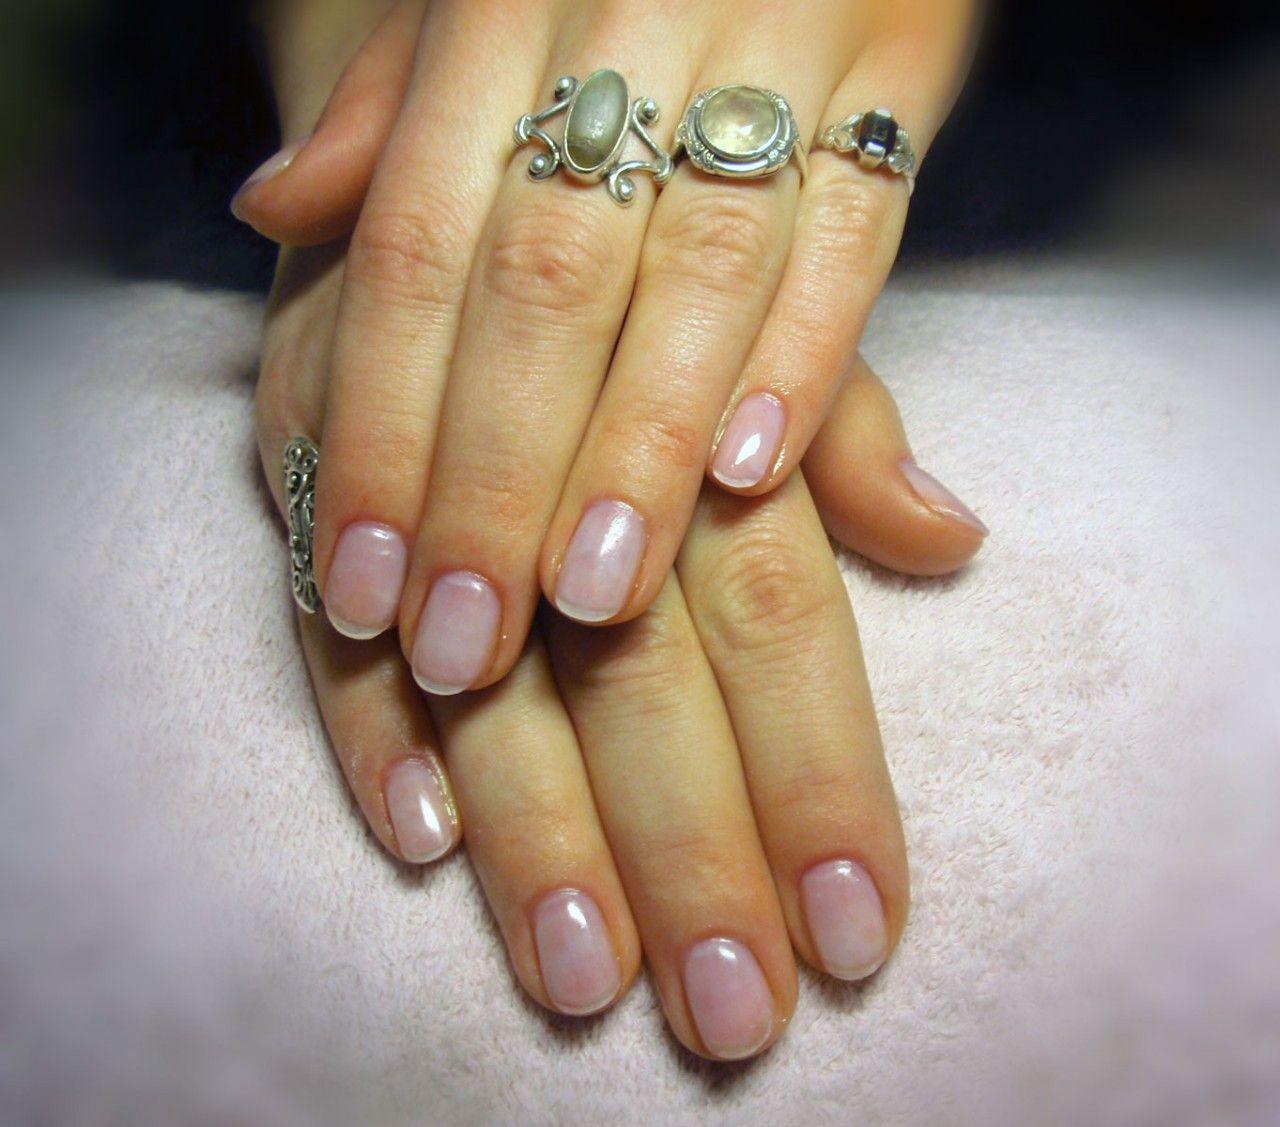 Fotogalerie Nailar Cz Nails Gemstone Rings Gemstones